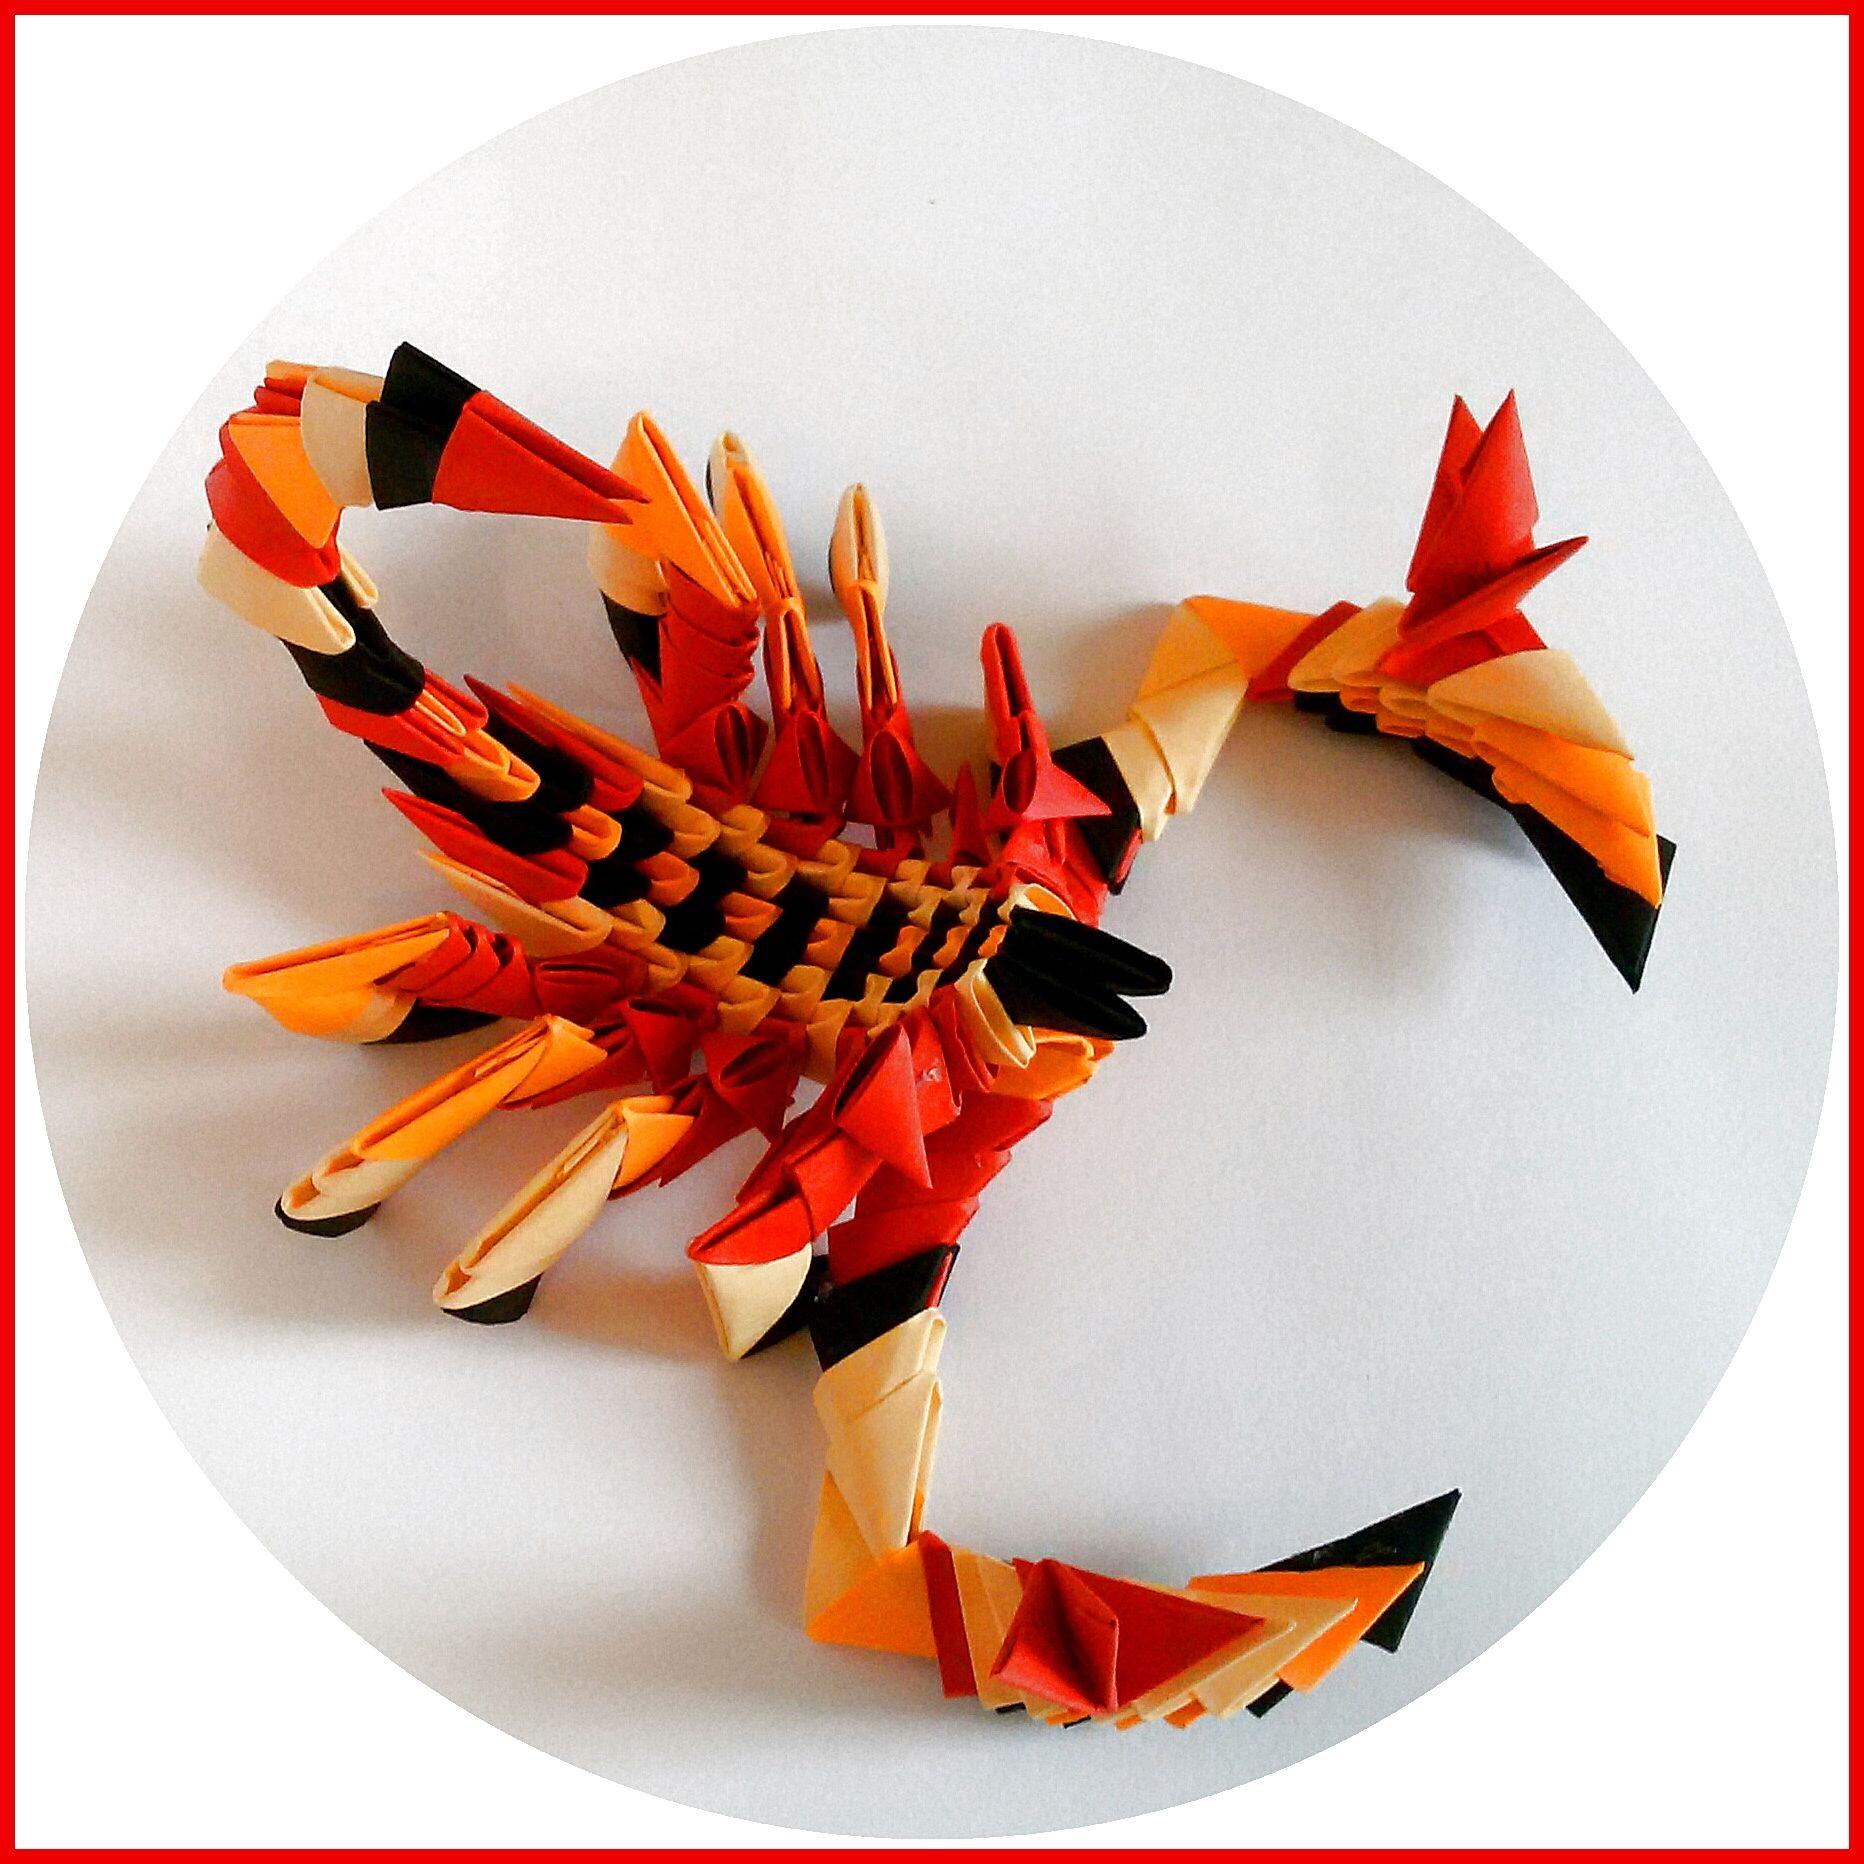 3d origami scorpion httpsfacebooklyuba3dorigami how to make origami scorpion tutorial paper gift jeuxipadfo Gallery